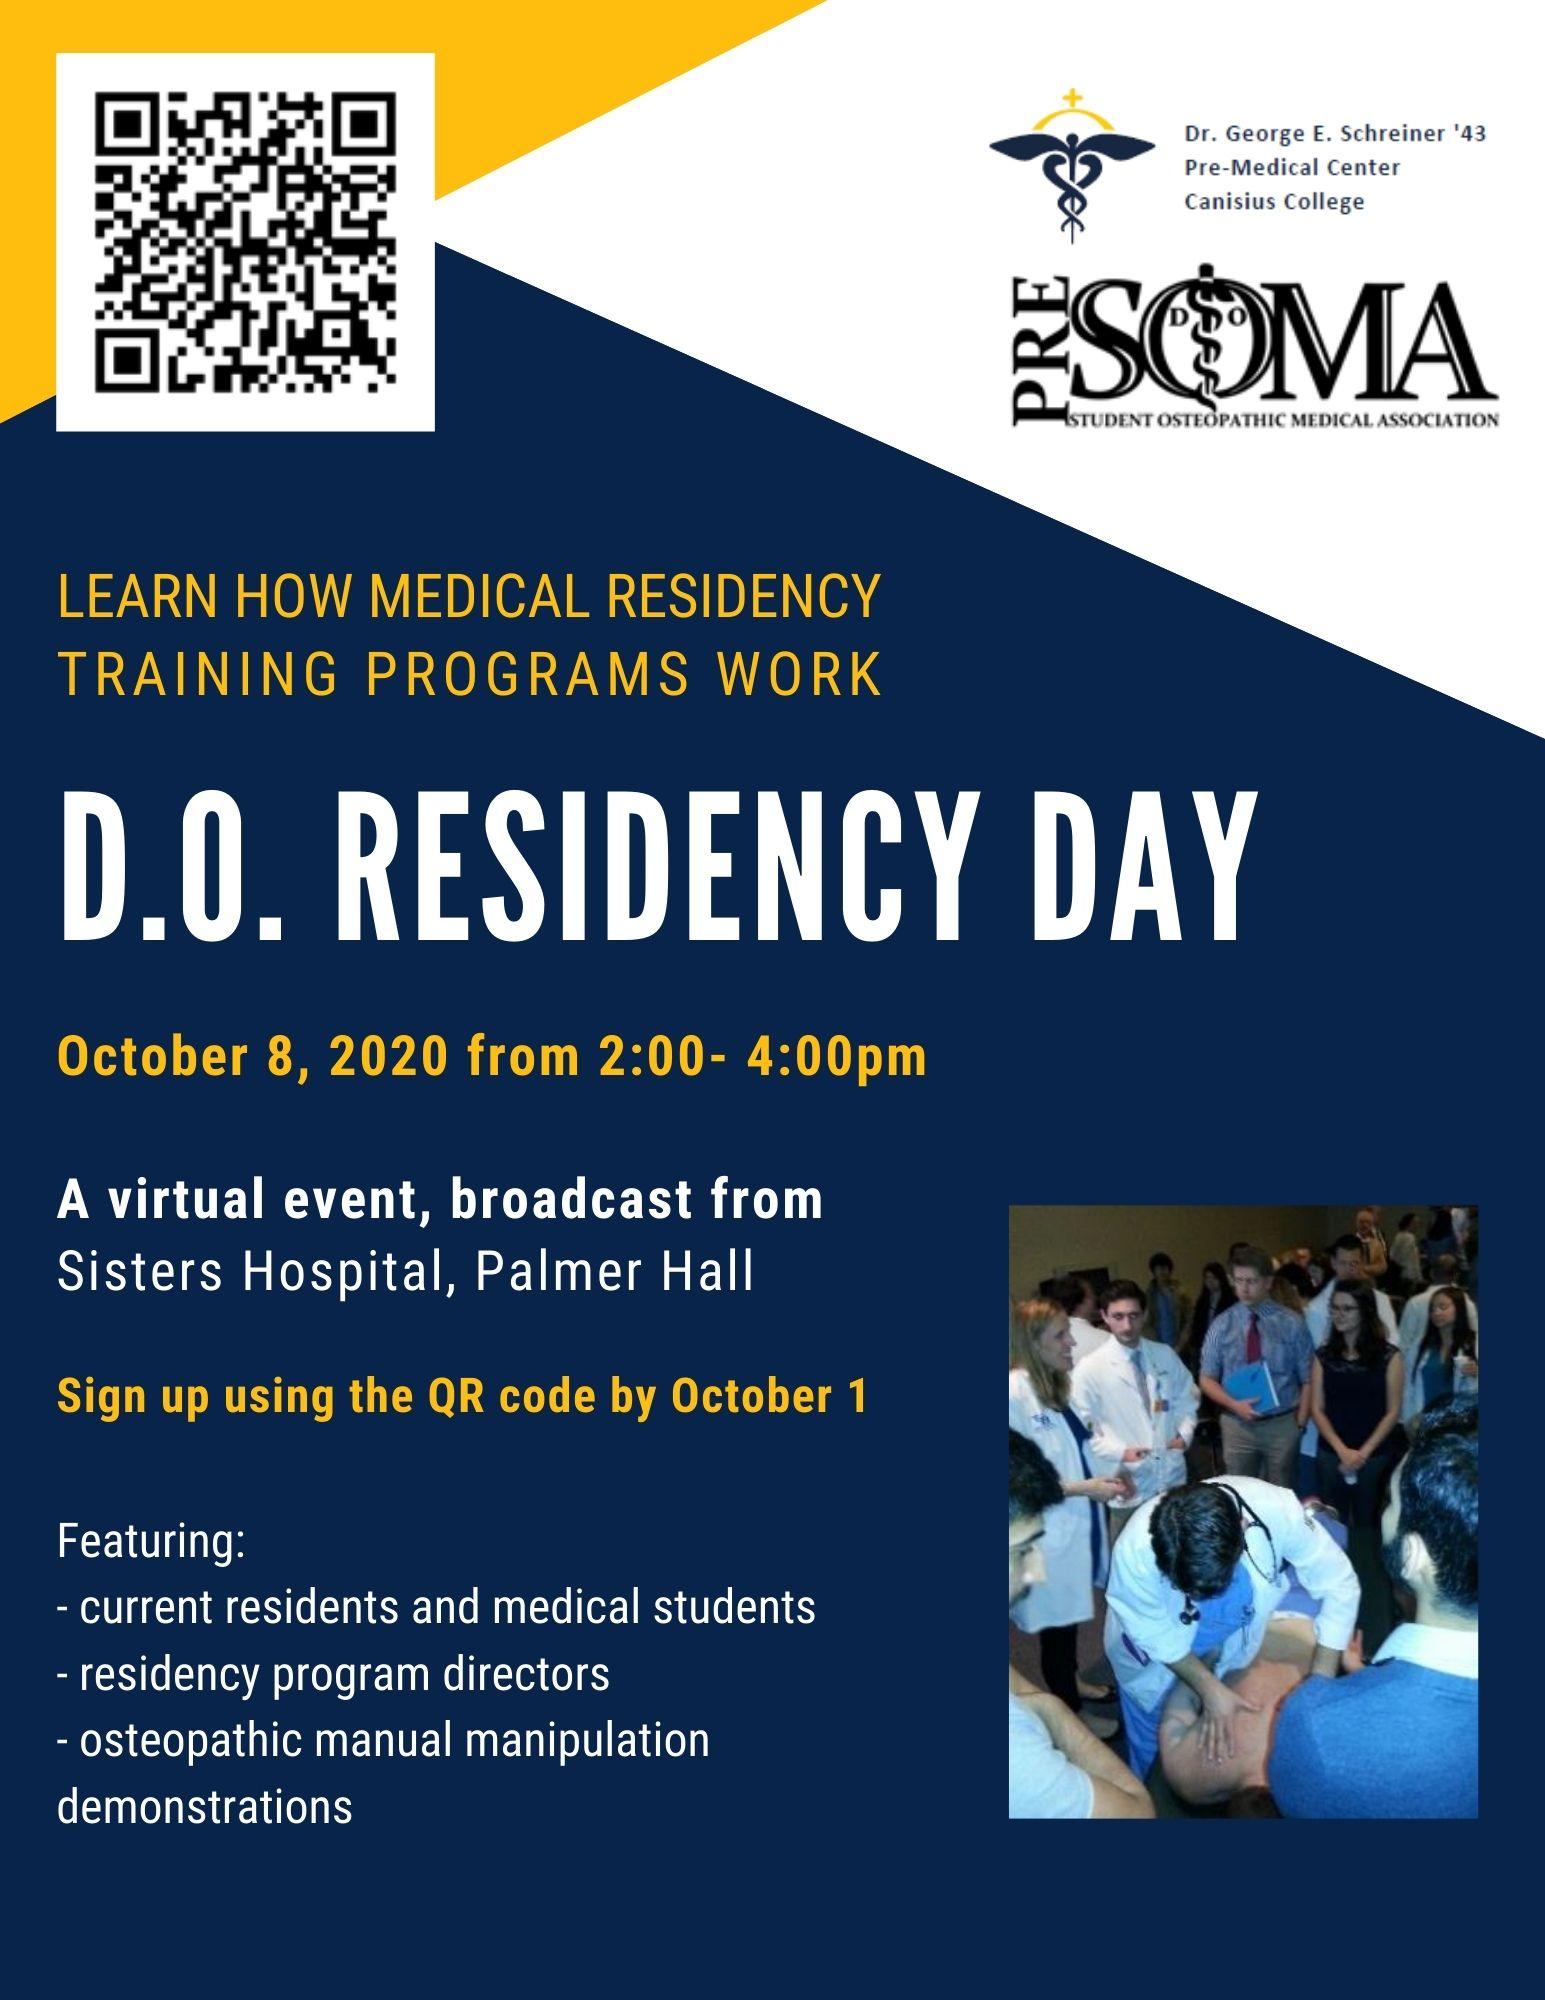 D.O. Residency Day version 1.jpg